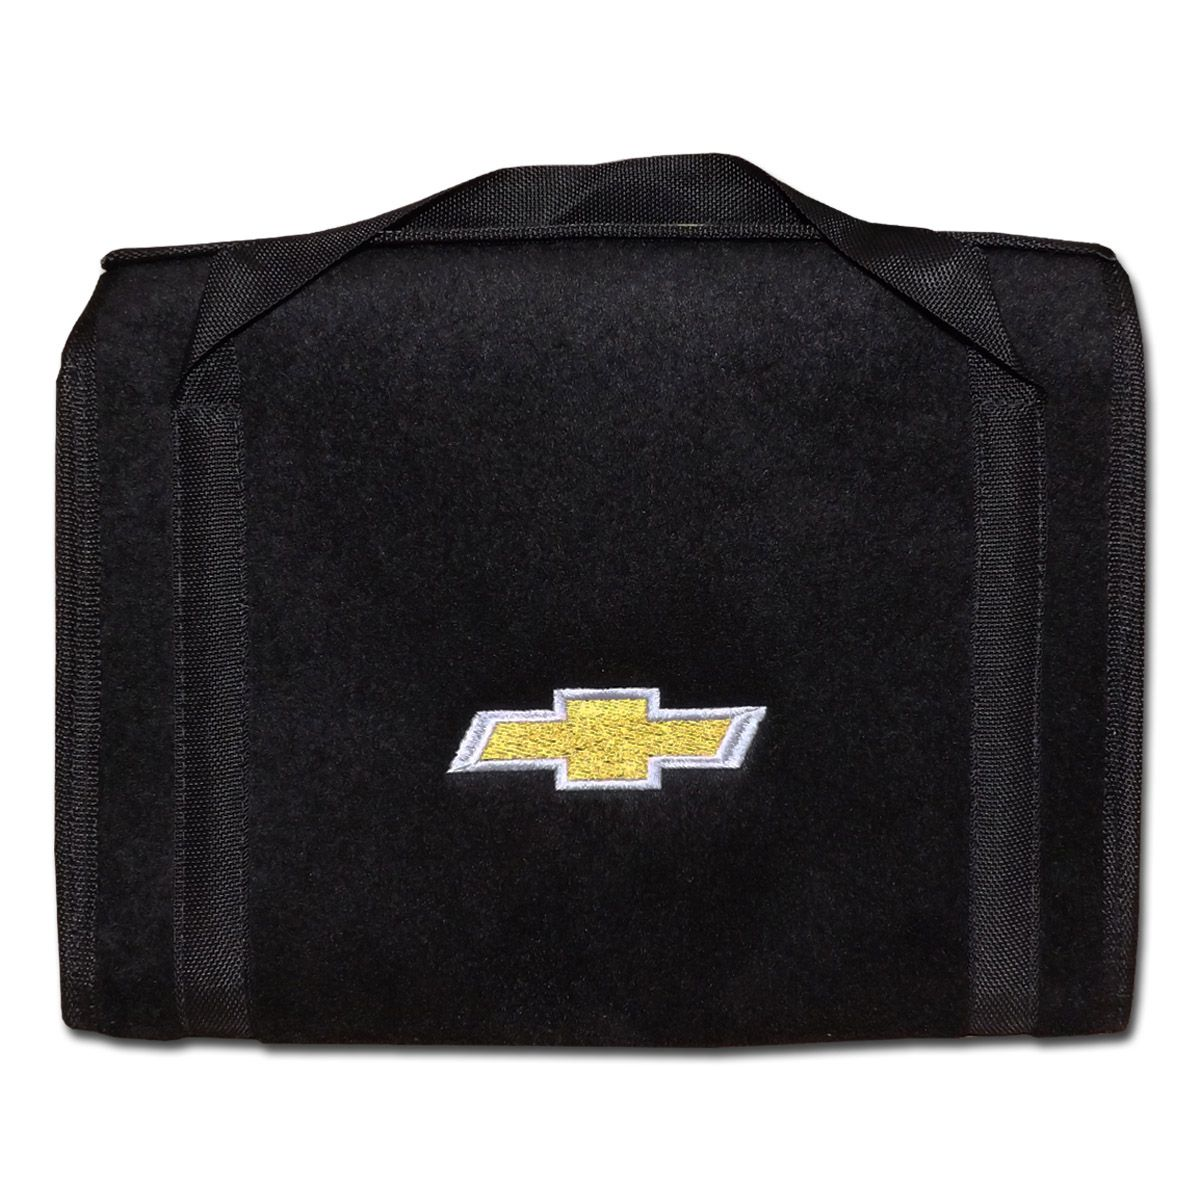 Bolsa Organizadora Porta Malas Universal Chevrolet Carpete